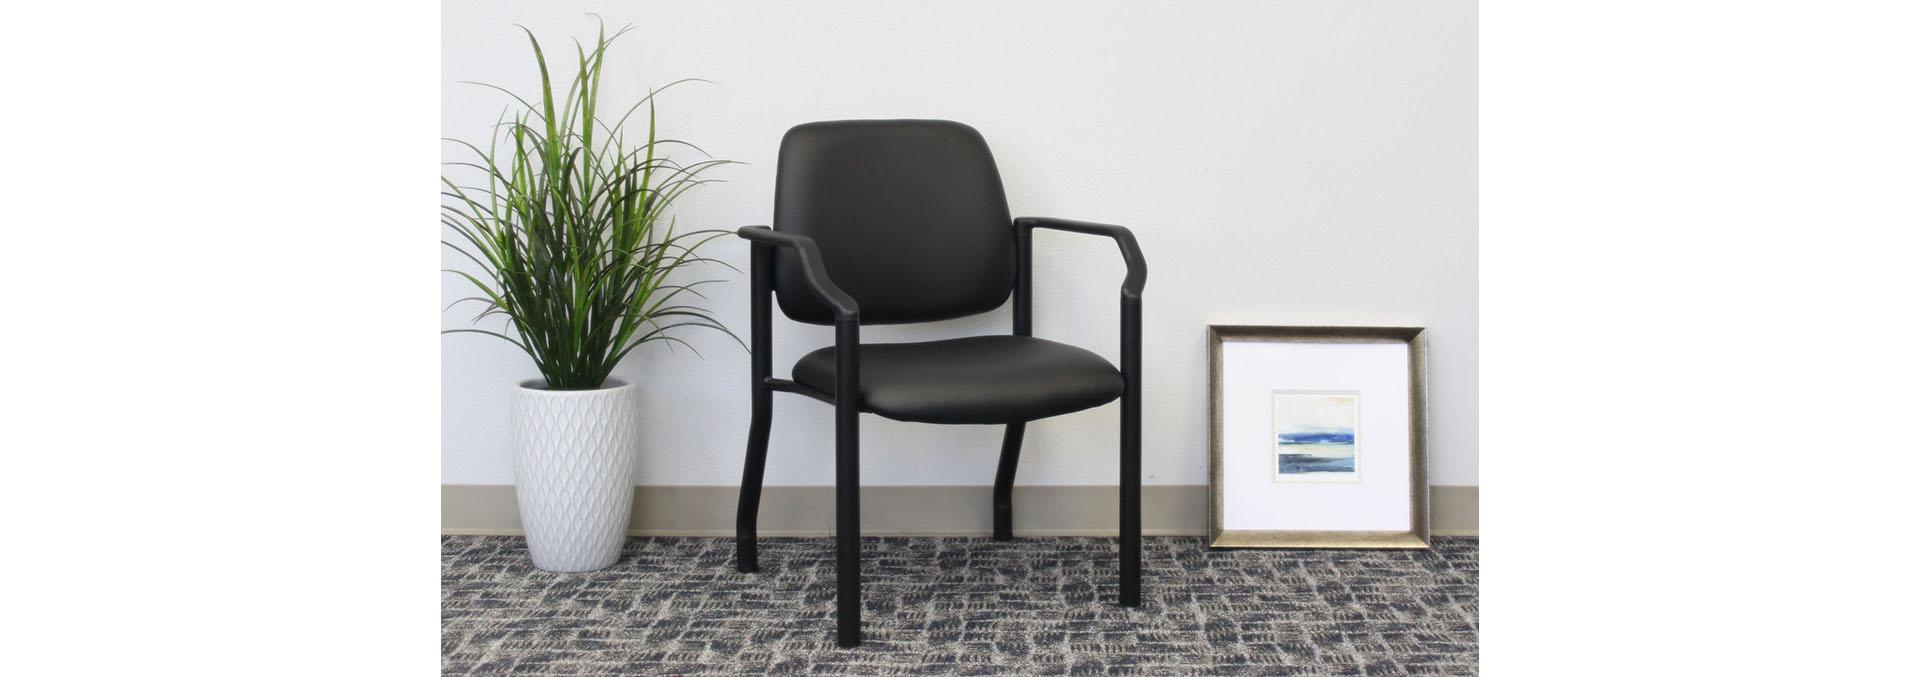 Office Furniture Catalog Pdf Car Design Today